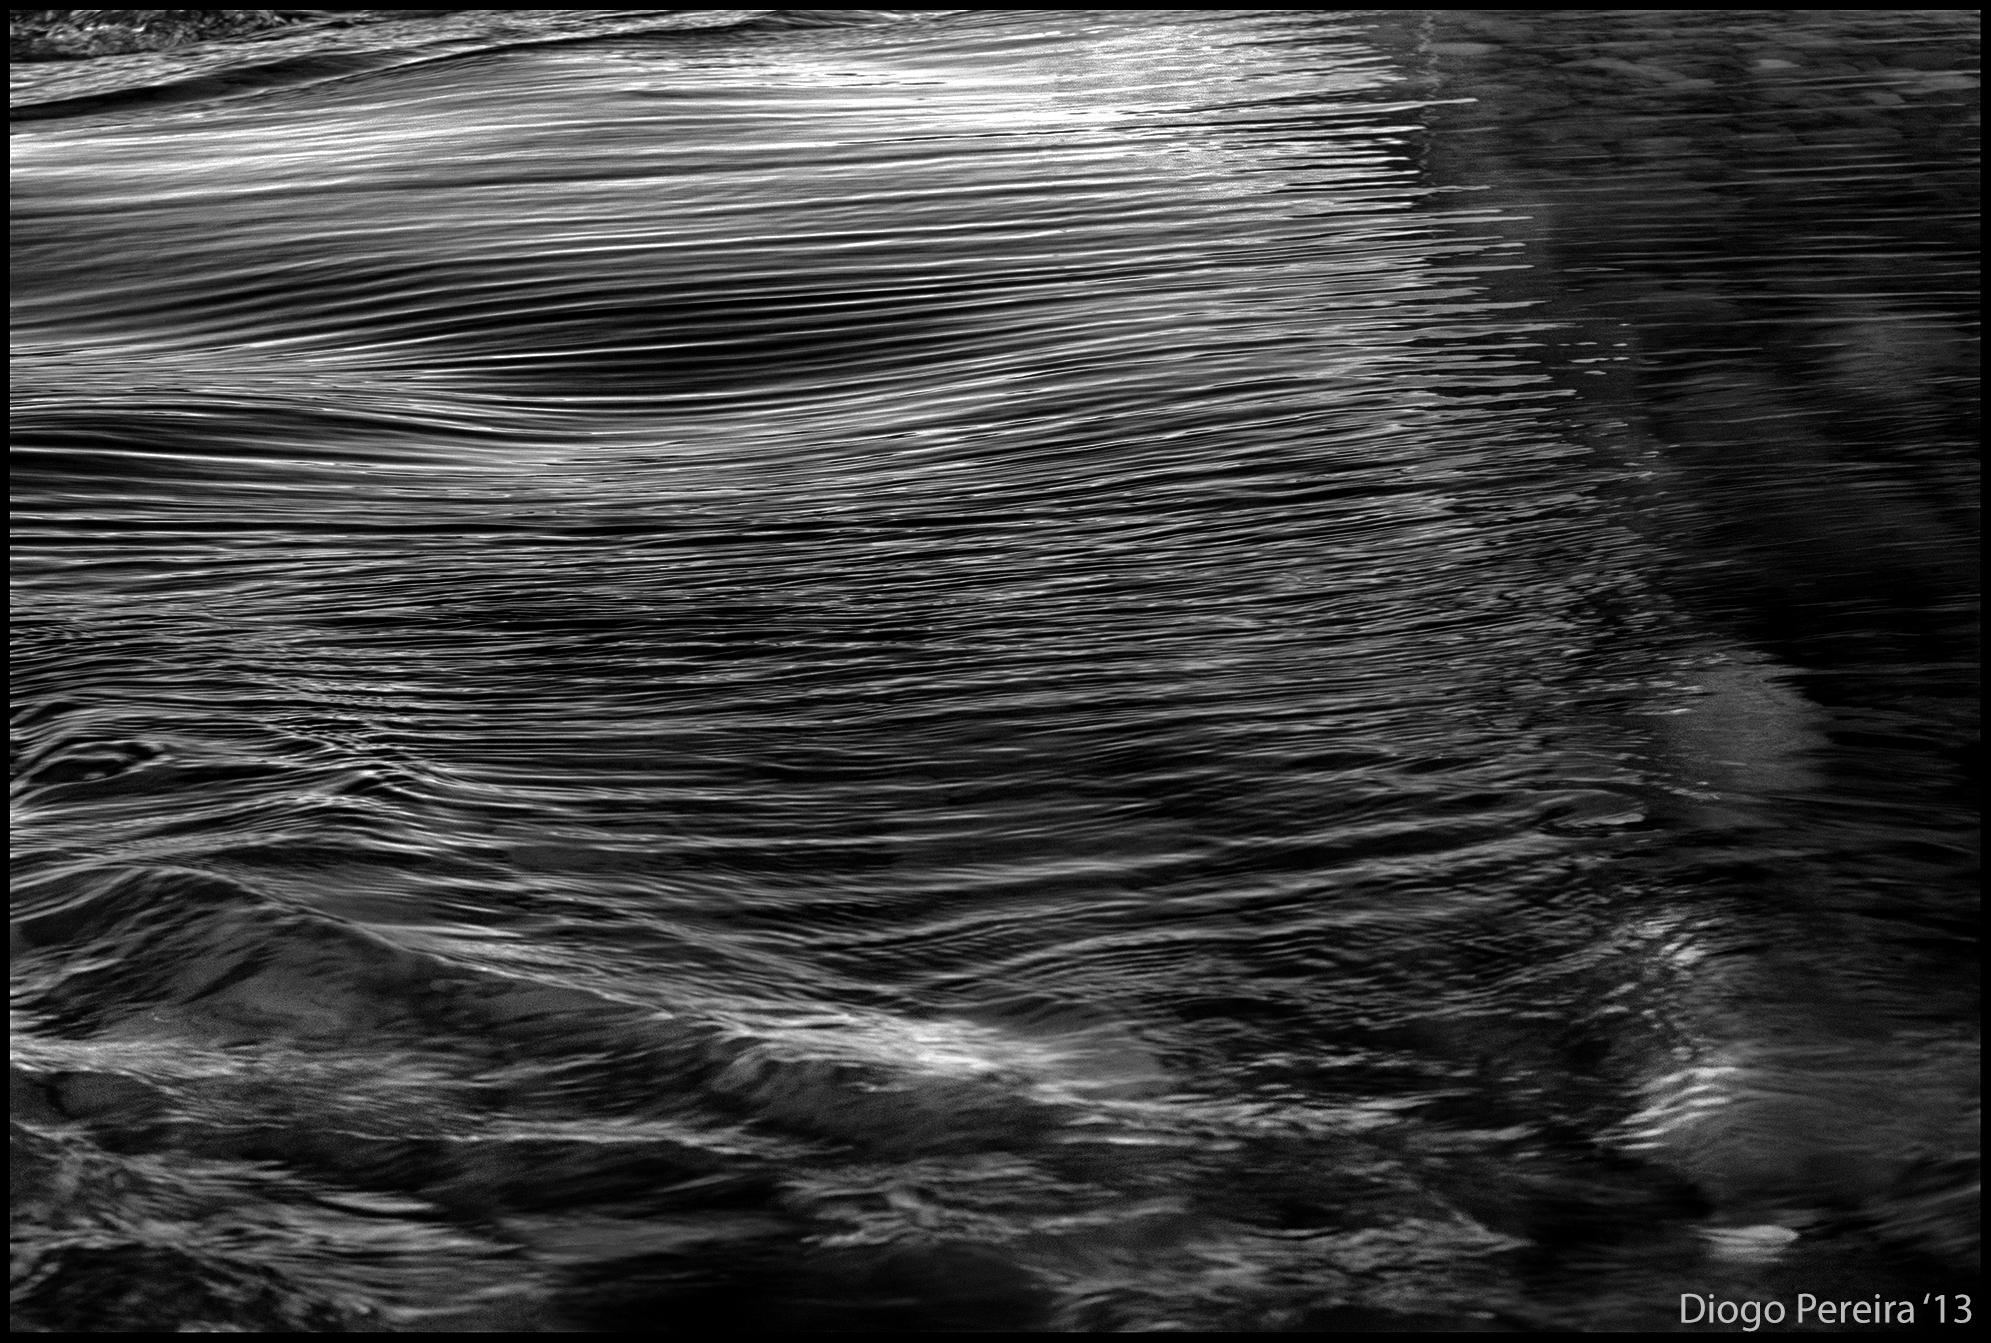 Whale texture - photo#6